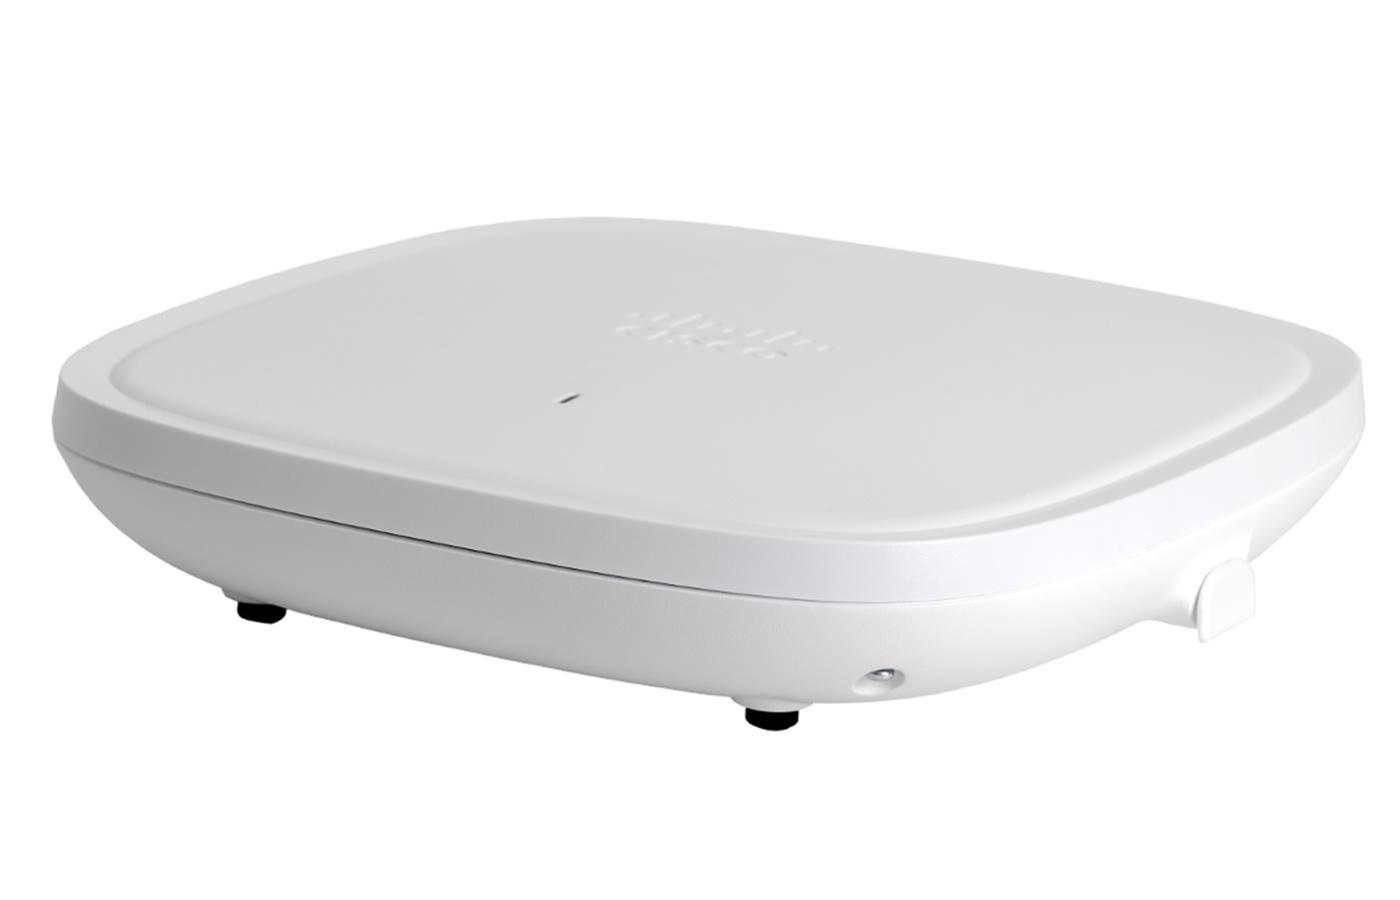 Cisco unveils Wi-Fi 6 core switches, access points